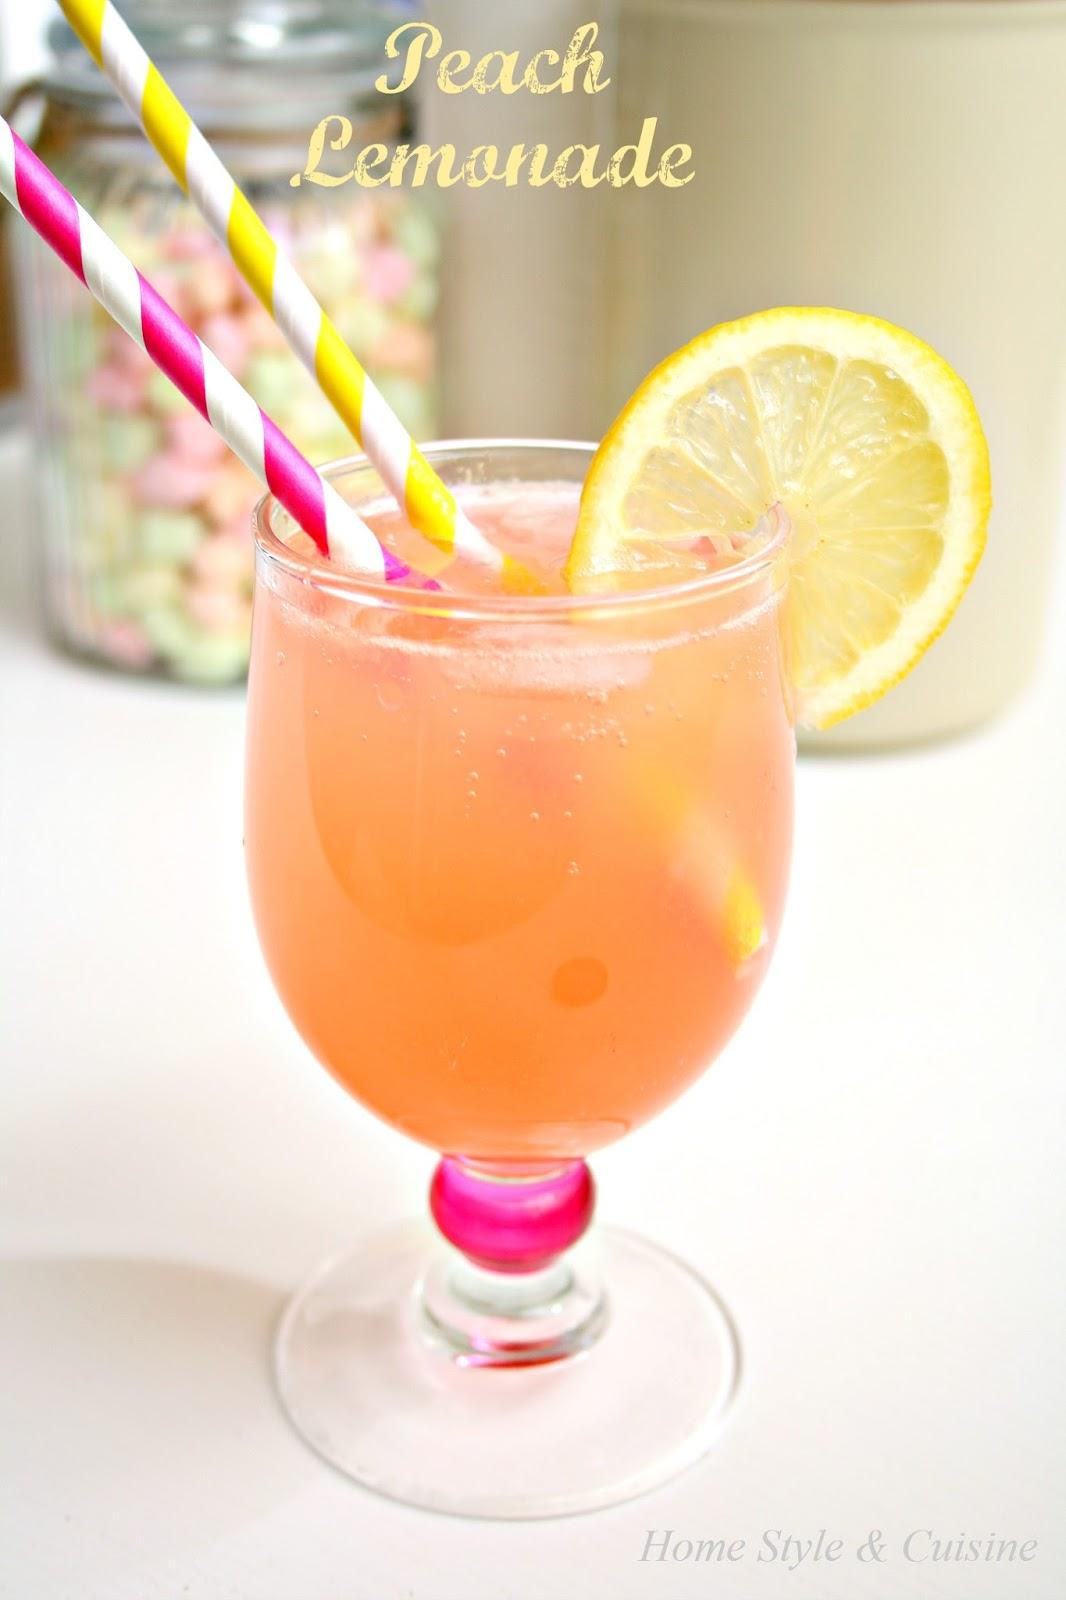 Home Style and Cuisine: Easy Homemade Peach Lemonade